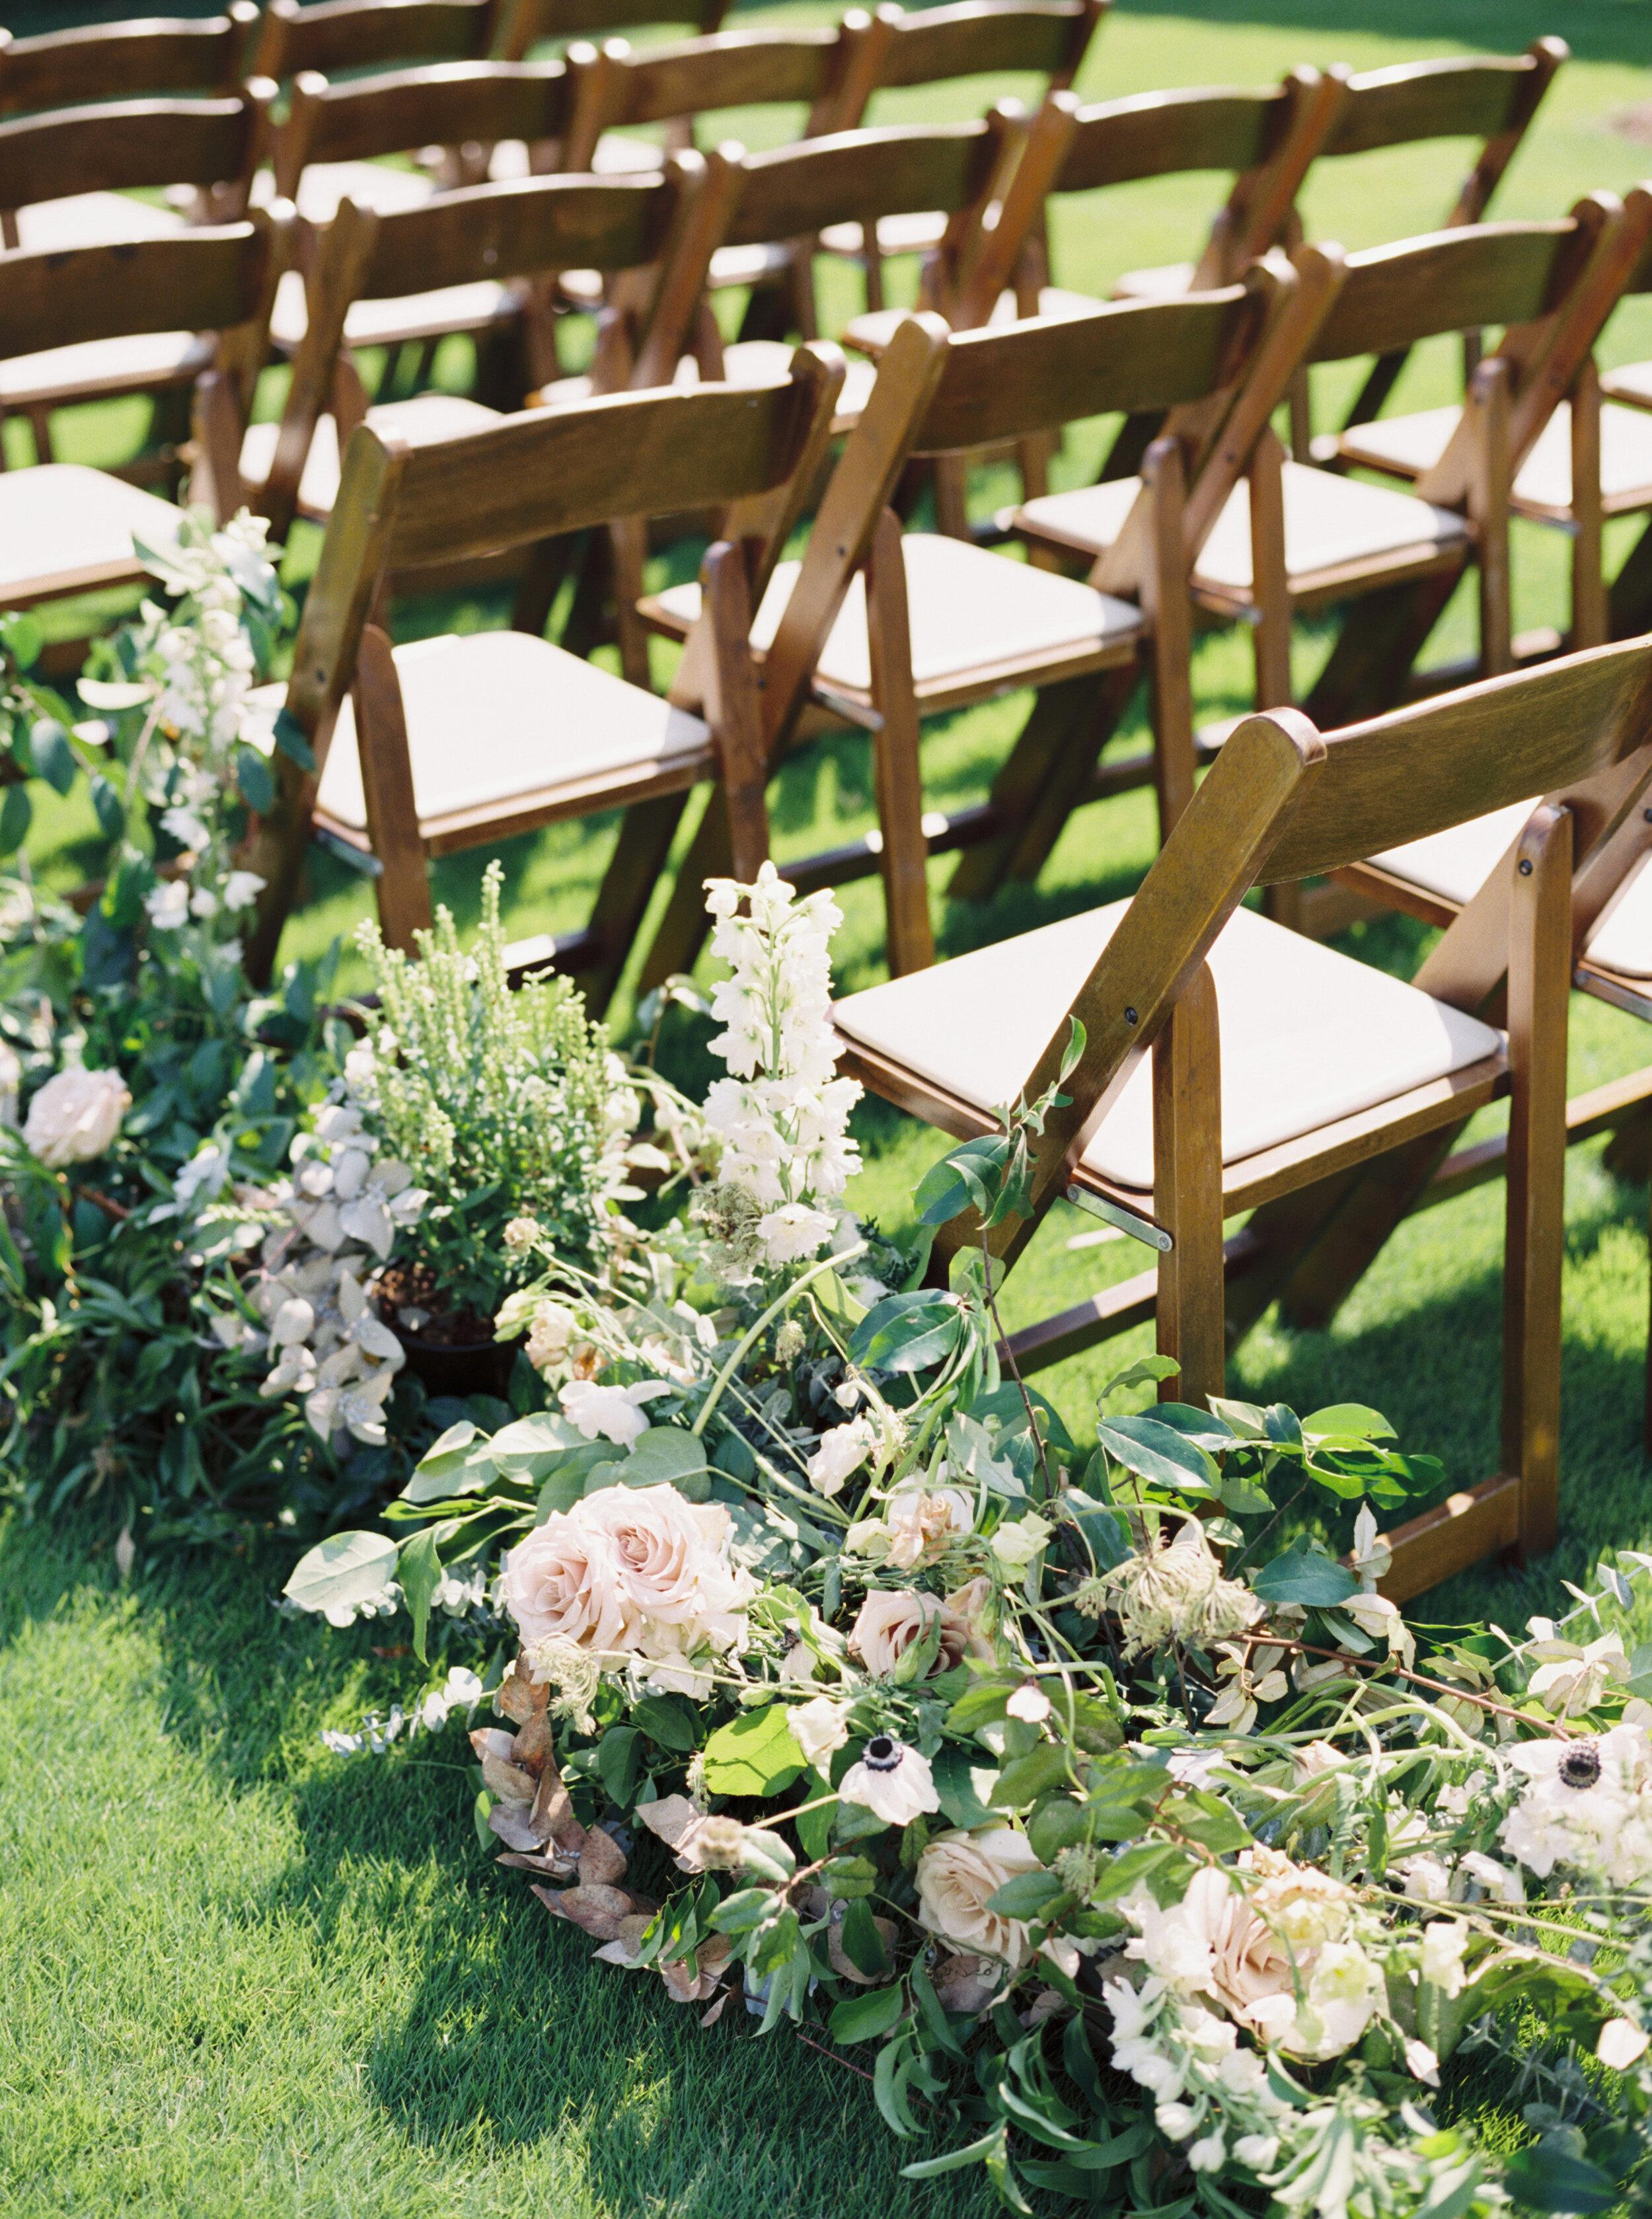 Bibb_Mill_Wedding_Editorial_Columbus_Georgia_Fallen_Photography_3-21.JPG